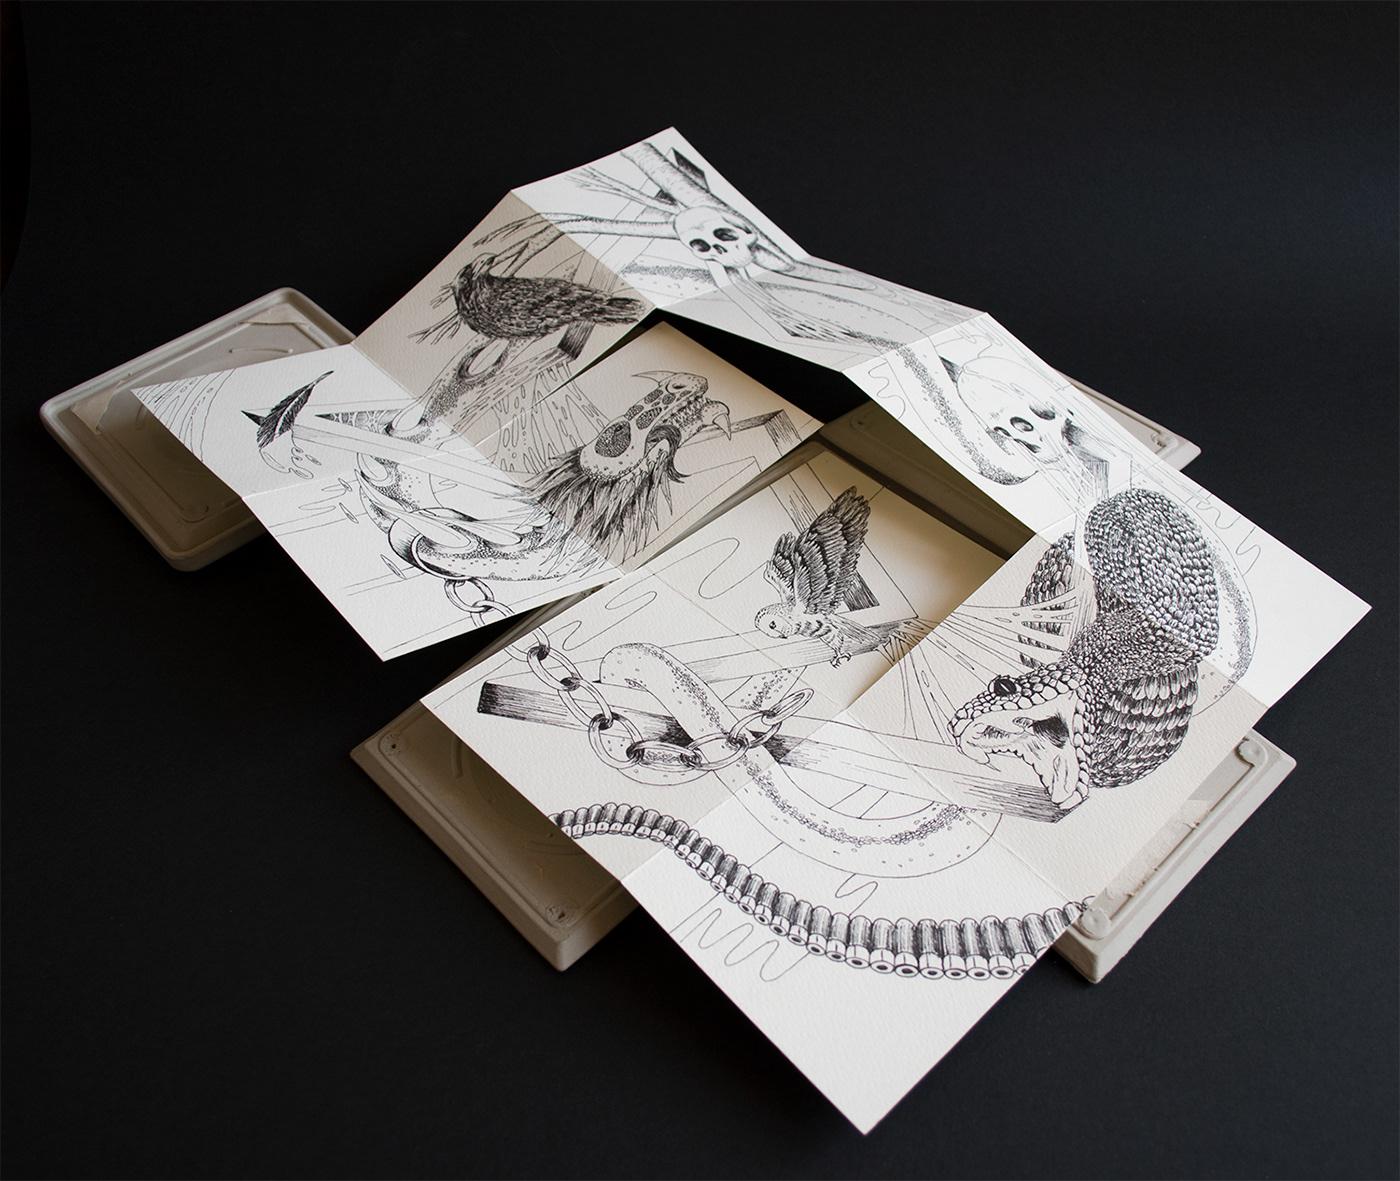 Caja pandora Guerra ilustracion dibujo ceramica ceramic libro de artista